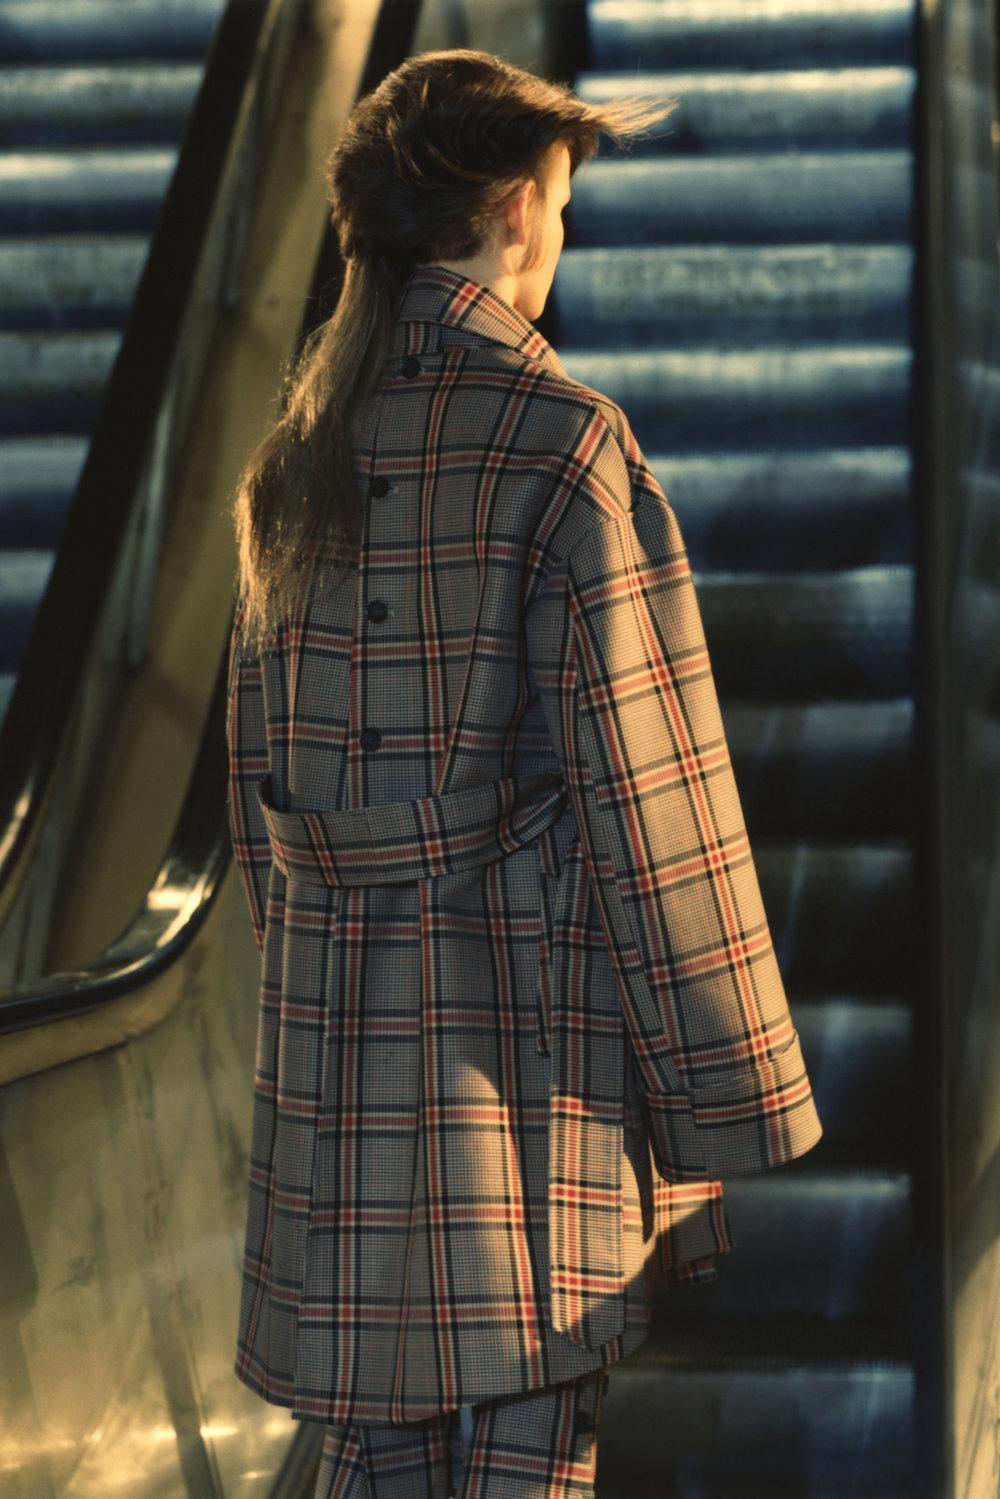 rokh_aw18_fashion_collection_magazine_vogue_26.jpg